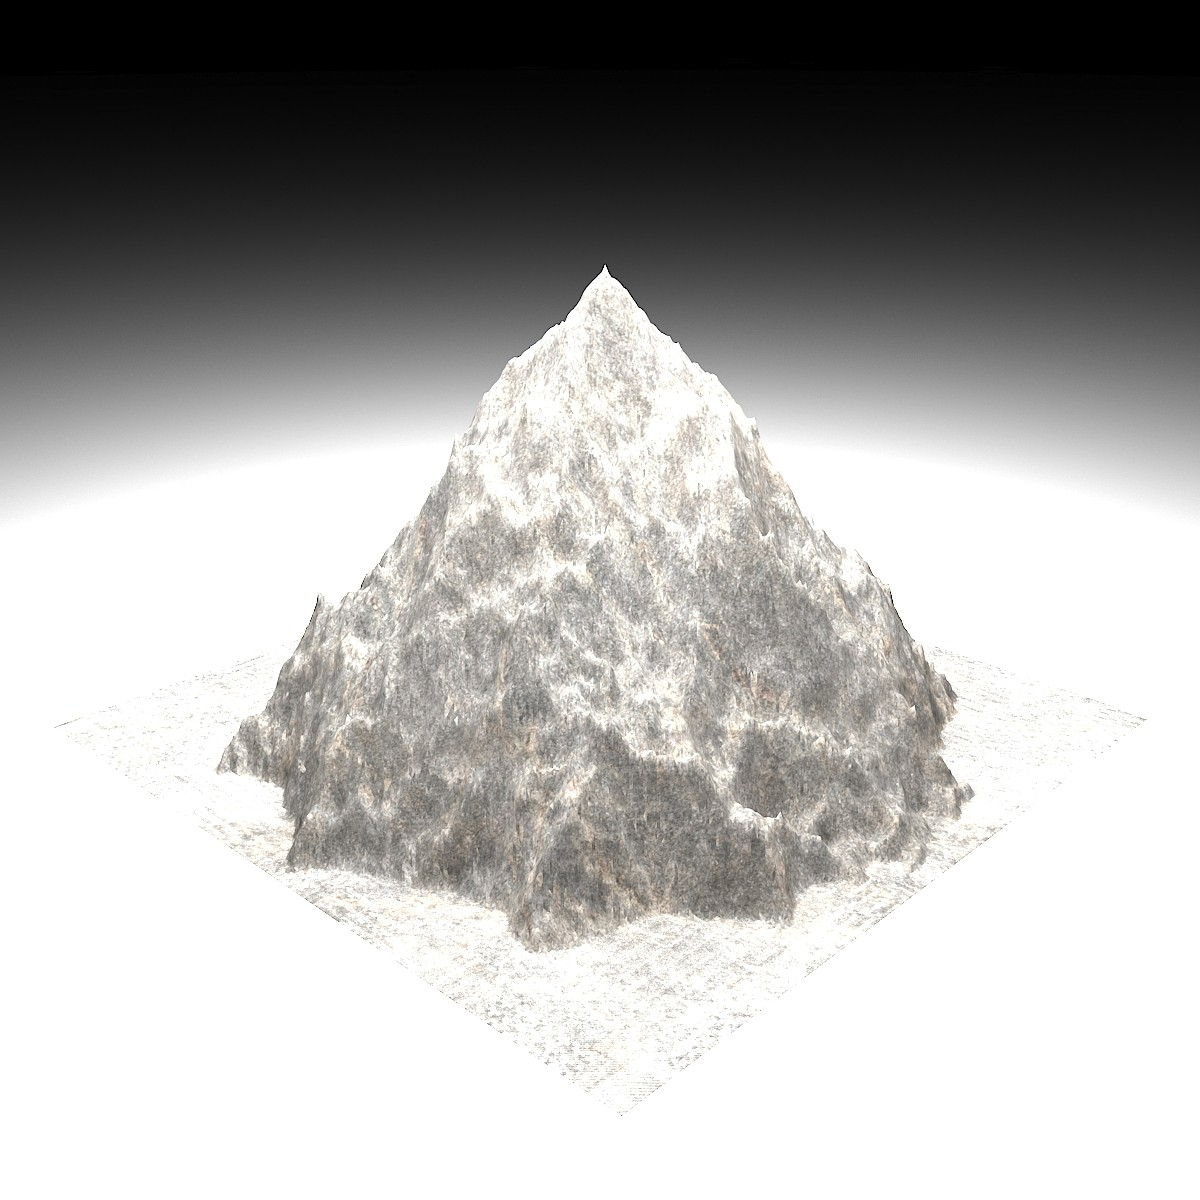 MOUNTAIN 0.jpg